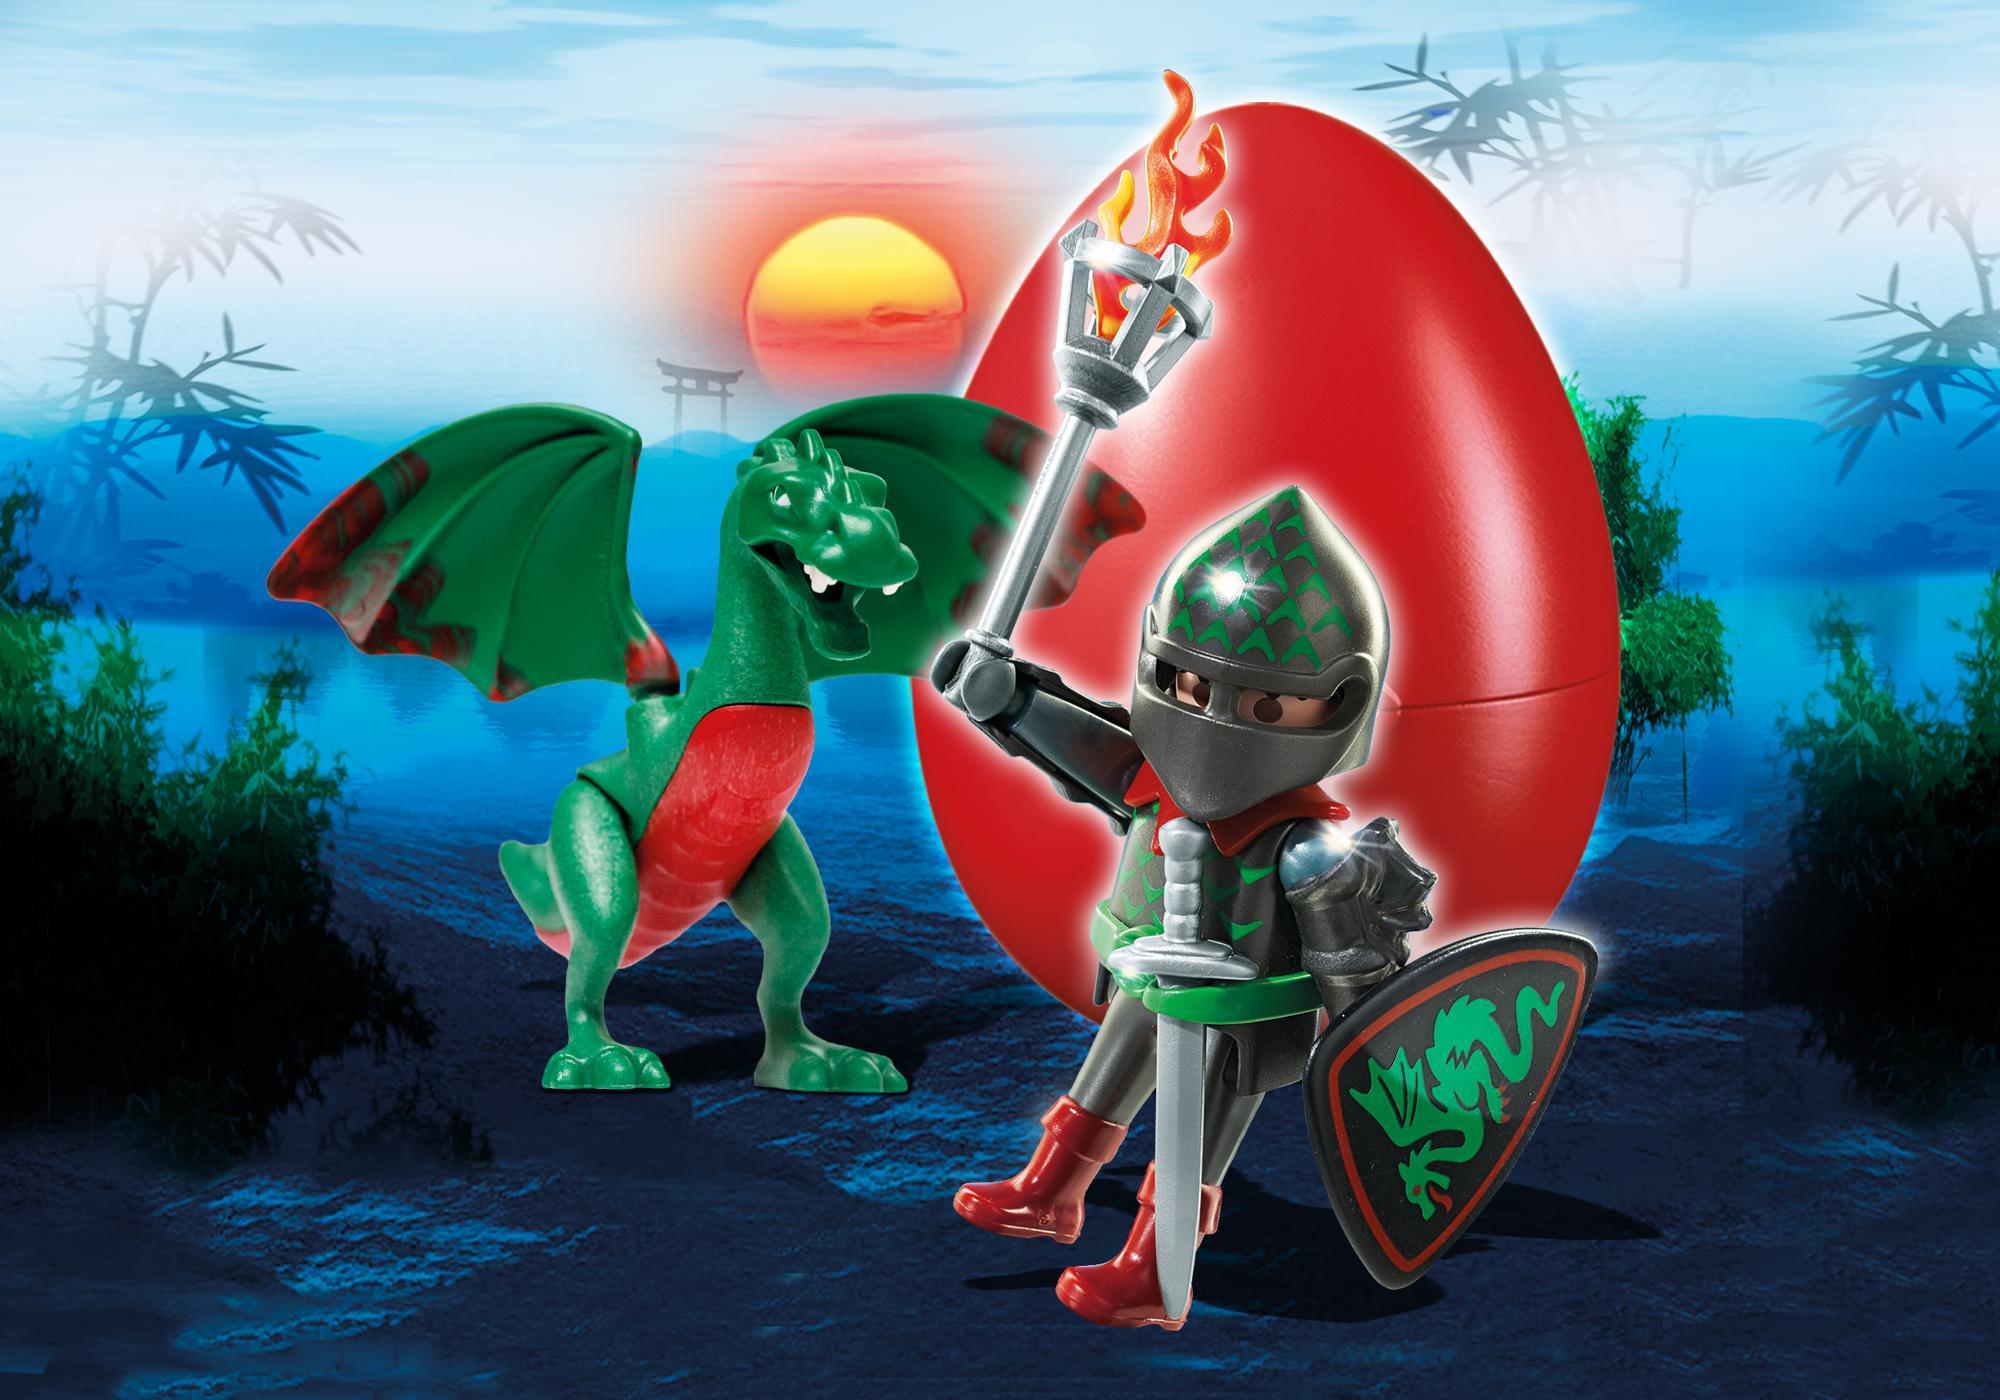 http://media.playmobil.com/i/playmobil/6836_product_detail/Drachenkämpfer